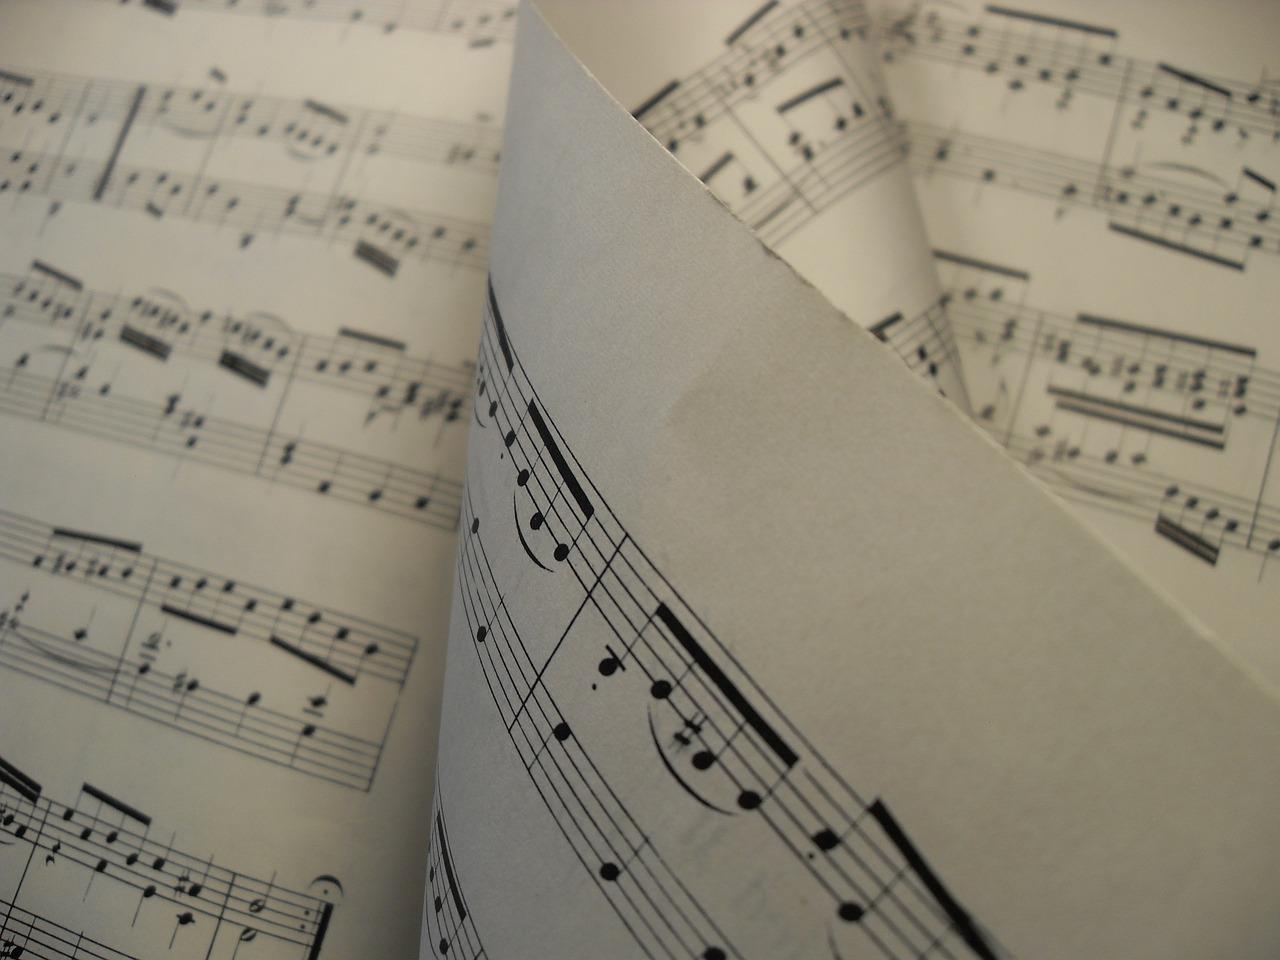 Redneck Mother Sheet Music Vi Wickam